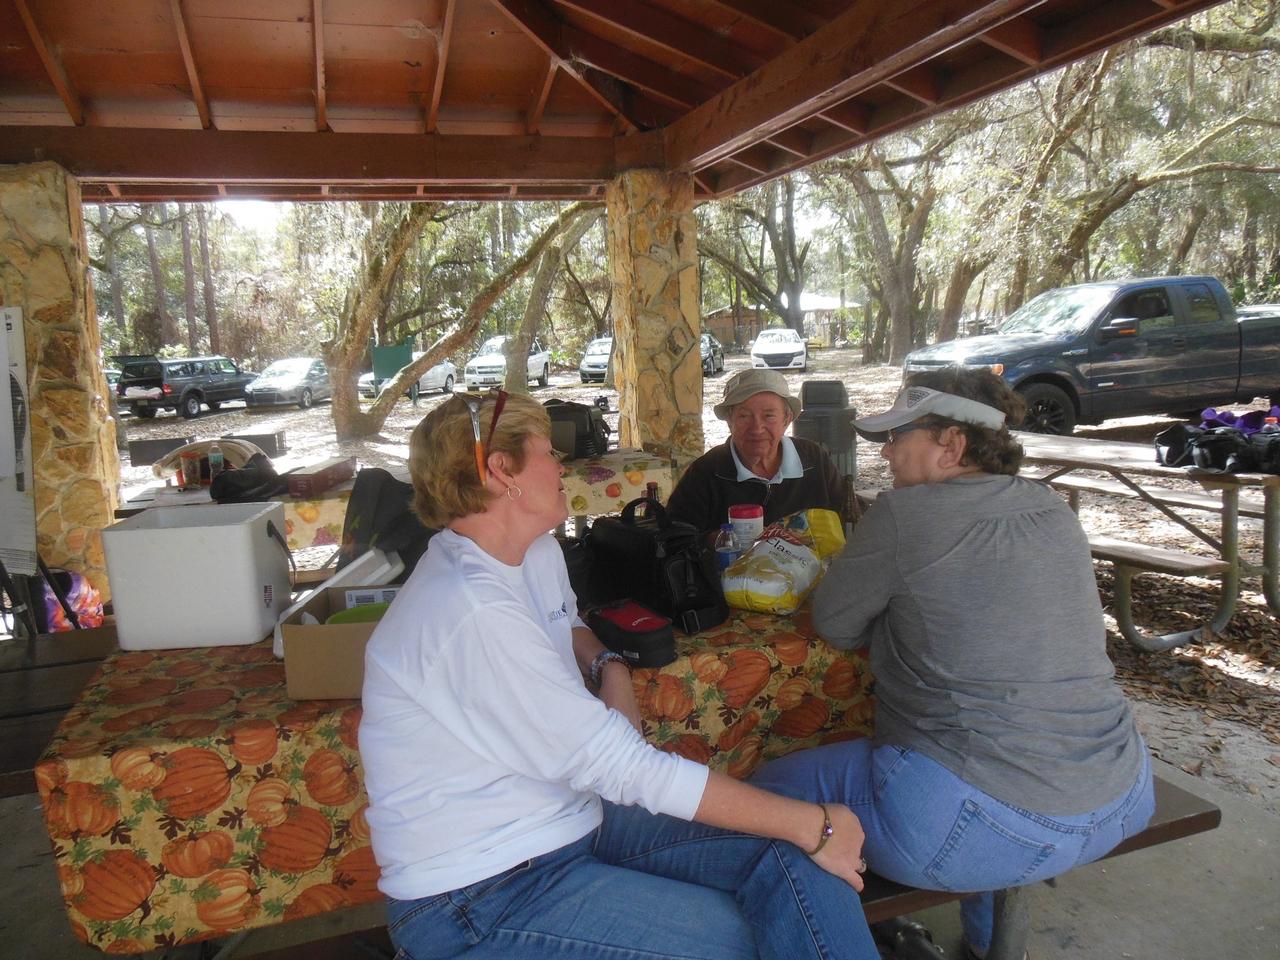 Southeast florida women seeking men